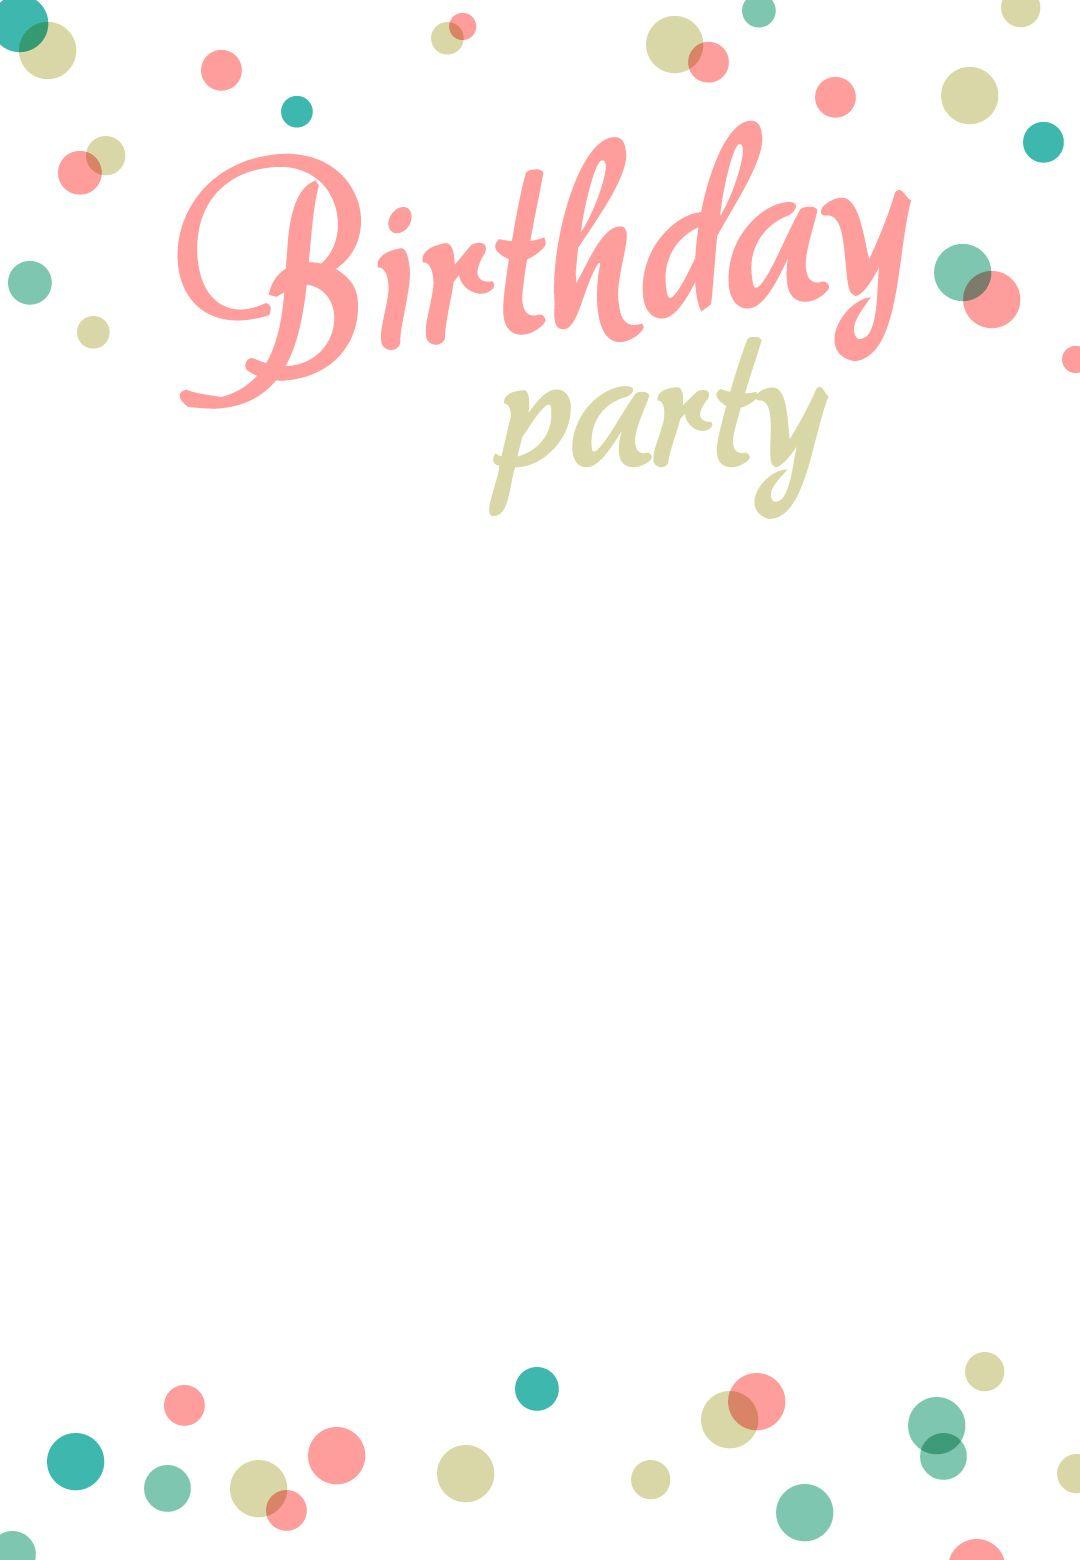 Birthday Party #invitation Free Printable | Addison's 1St Birthday - Free Printable Birthday Invitations